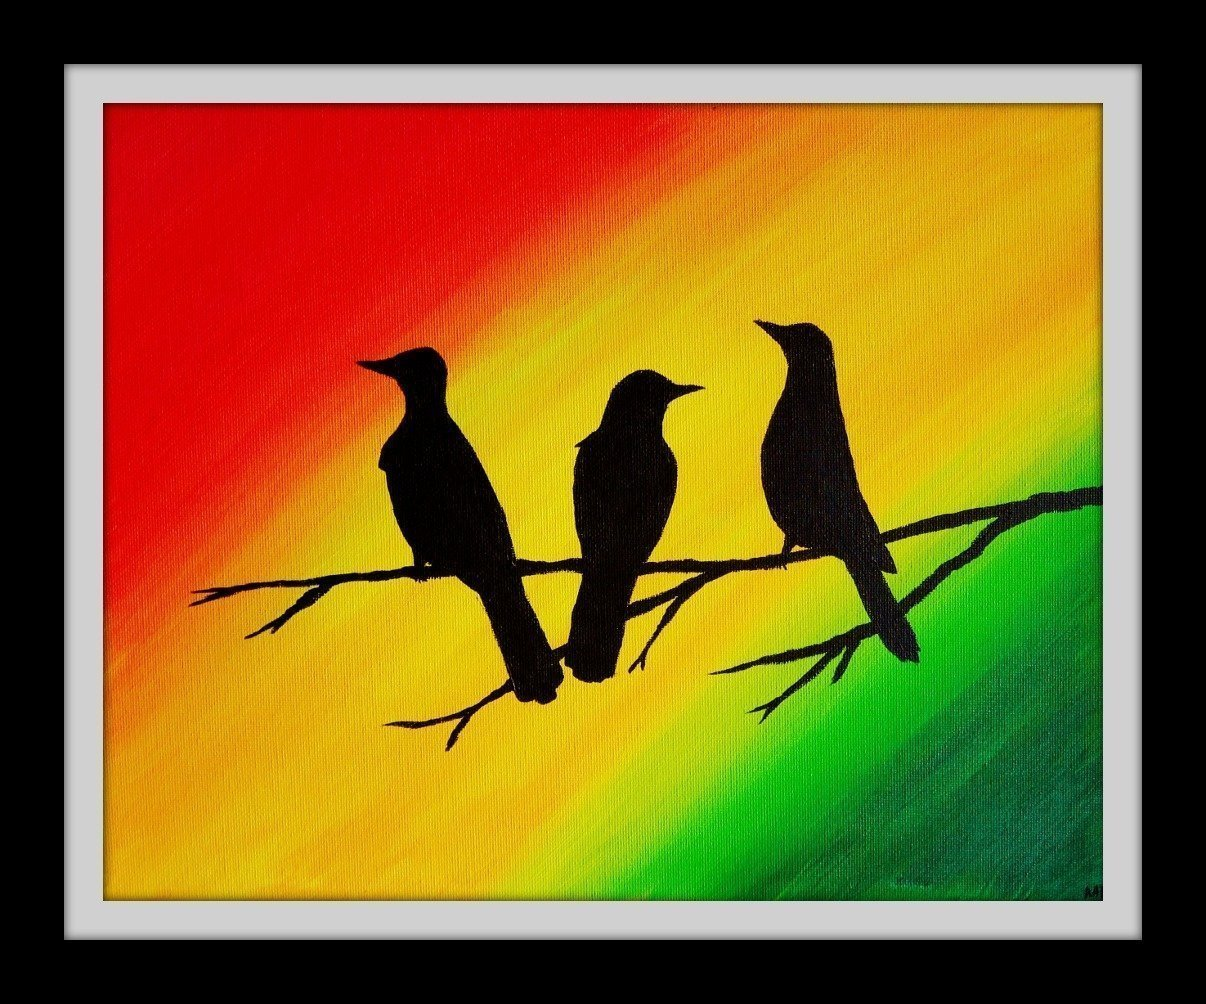 Amazon.com: Three Little Birds Art Music Decor Rasta Wall Art 11x14 ...